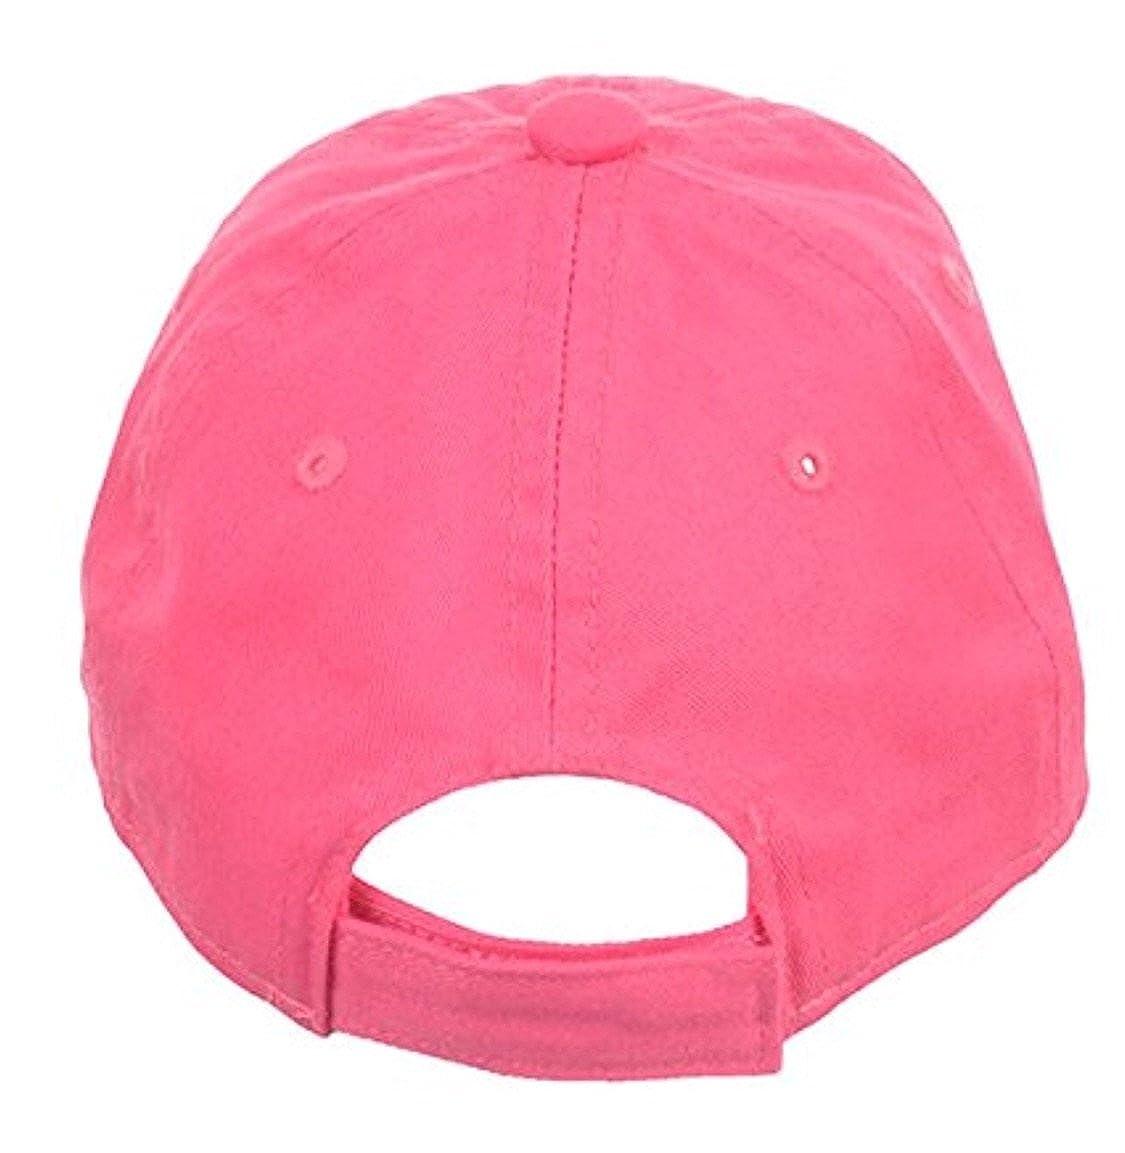 752c5c6461e Amazon.com  Puma Girls Evercat Podium Baseball Cap - pink white ...